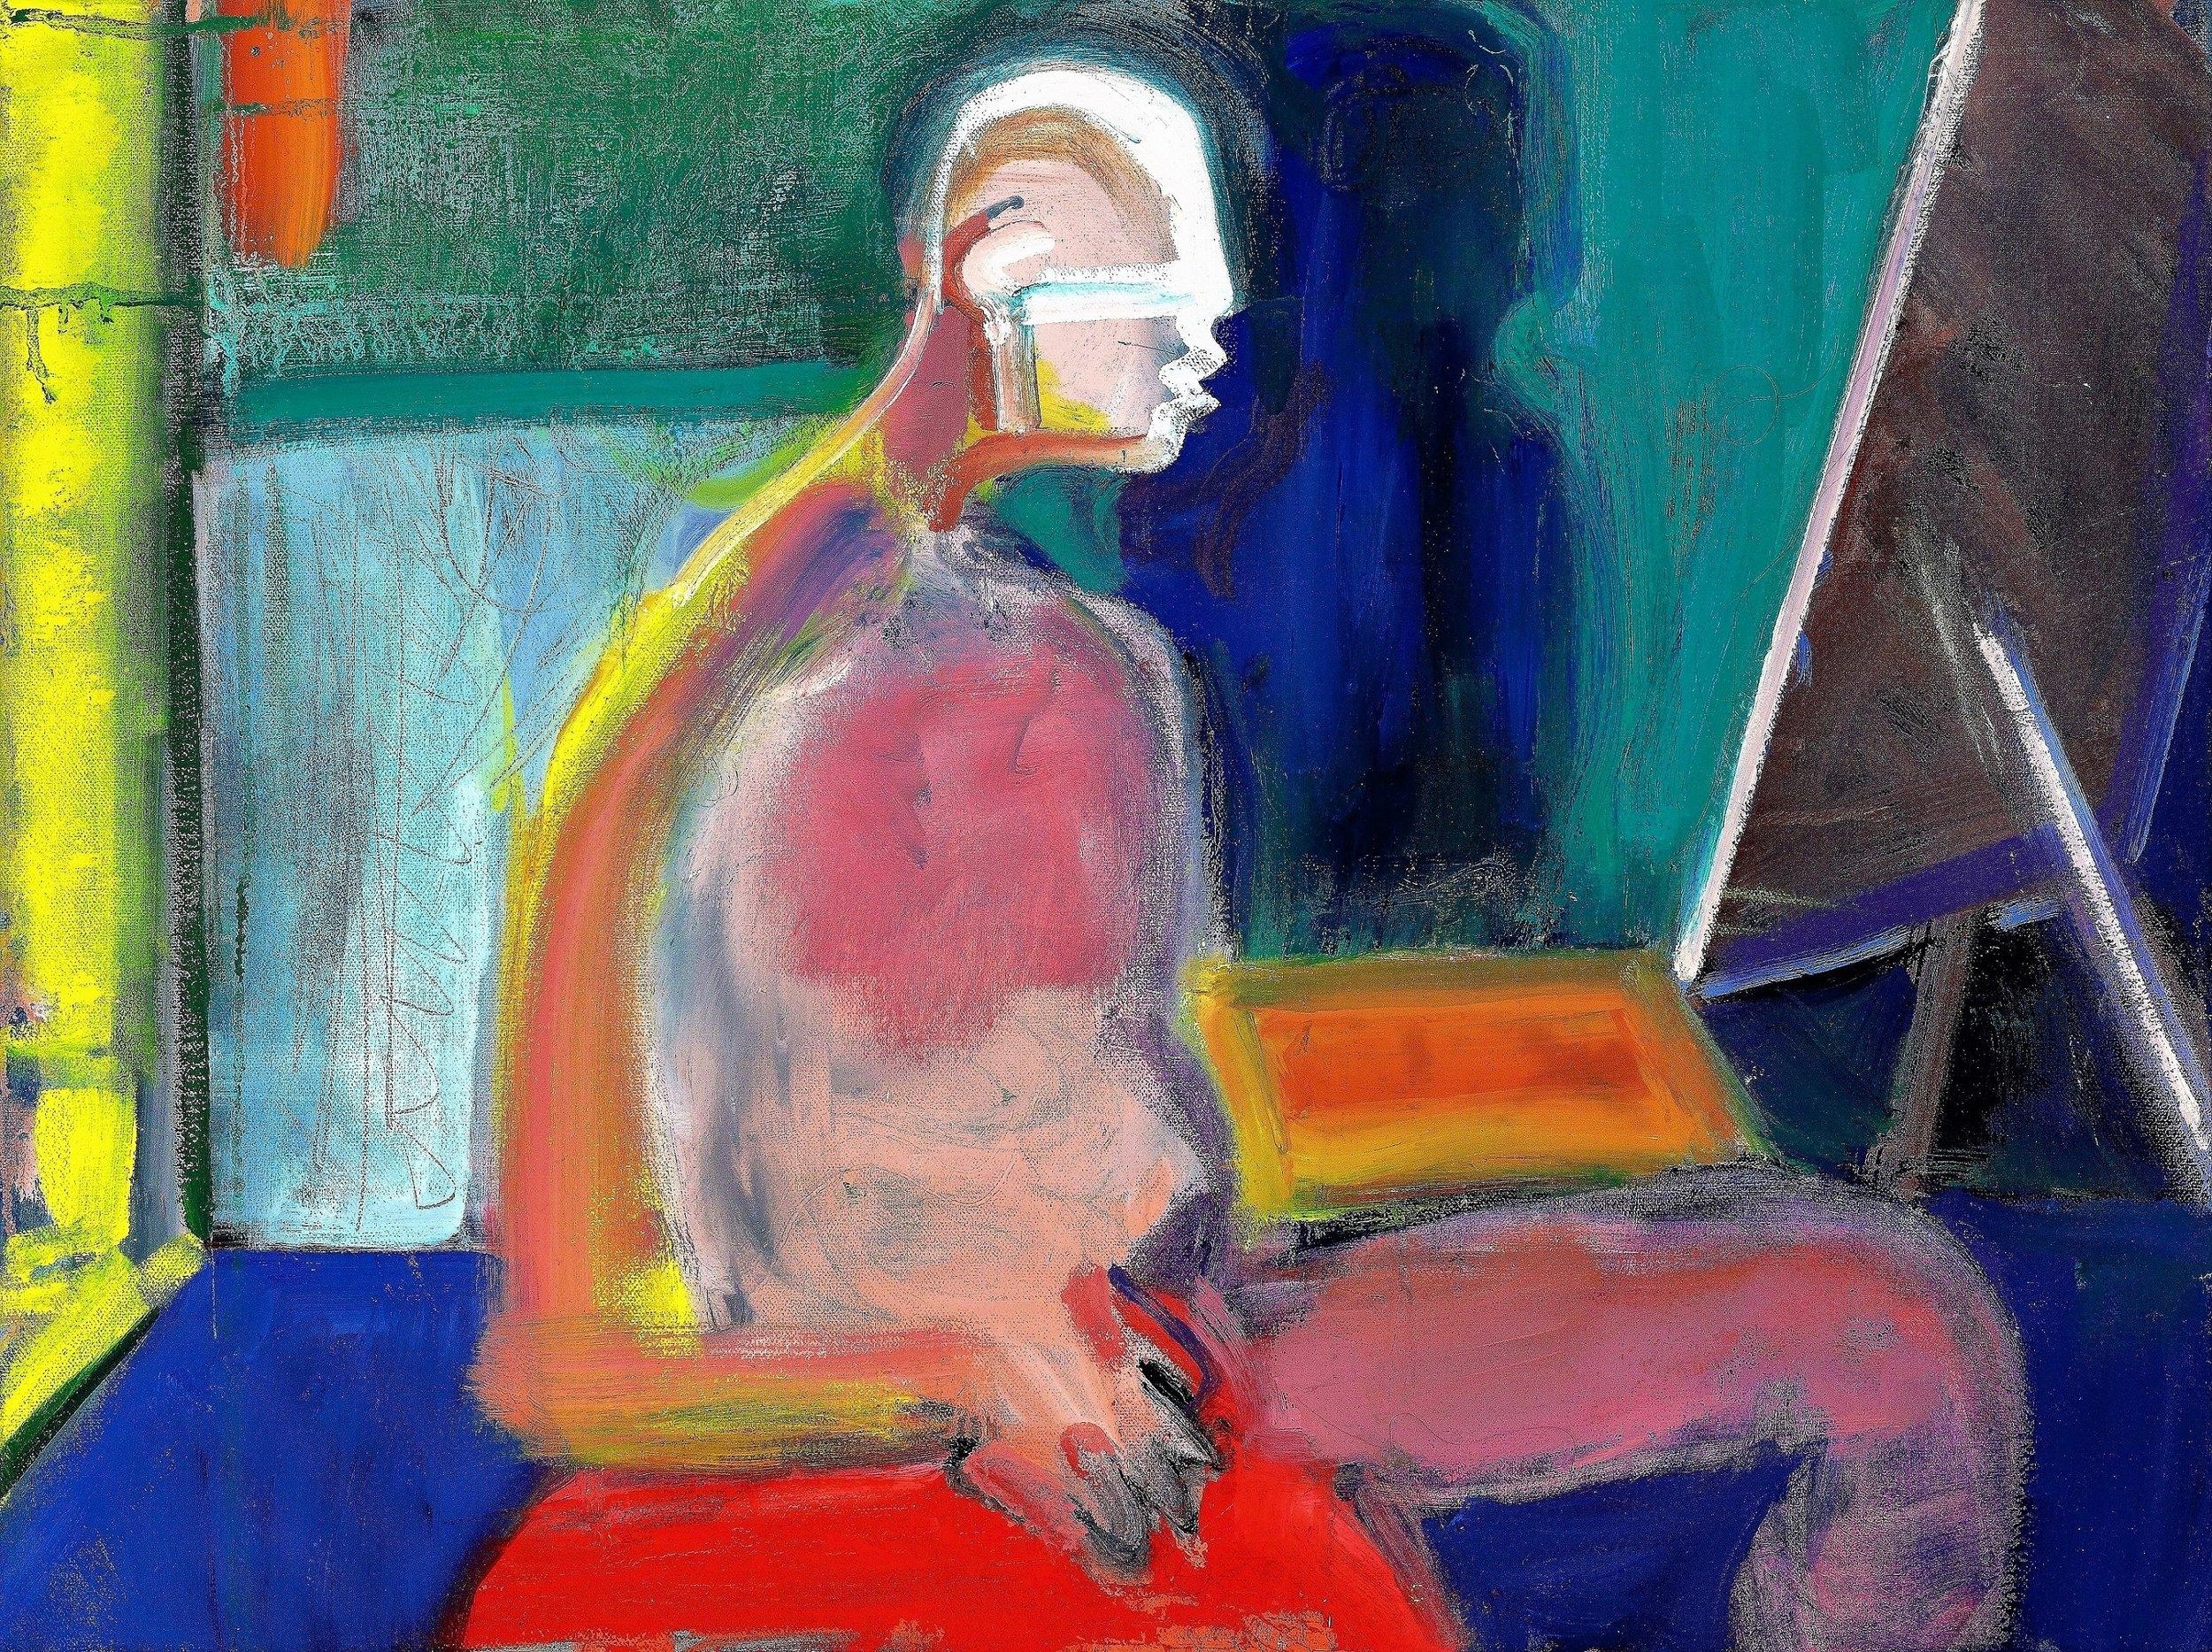 "#5, 2018, Oil on Canvas, 18 x 24"""